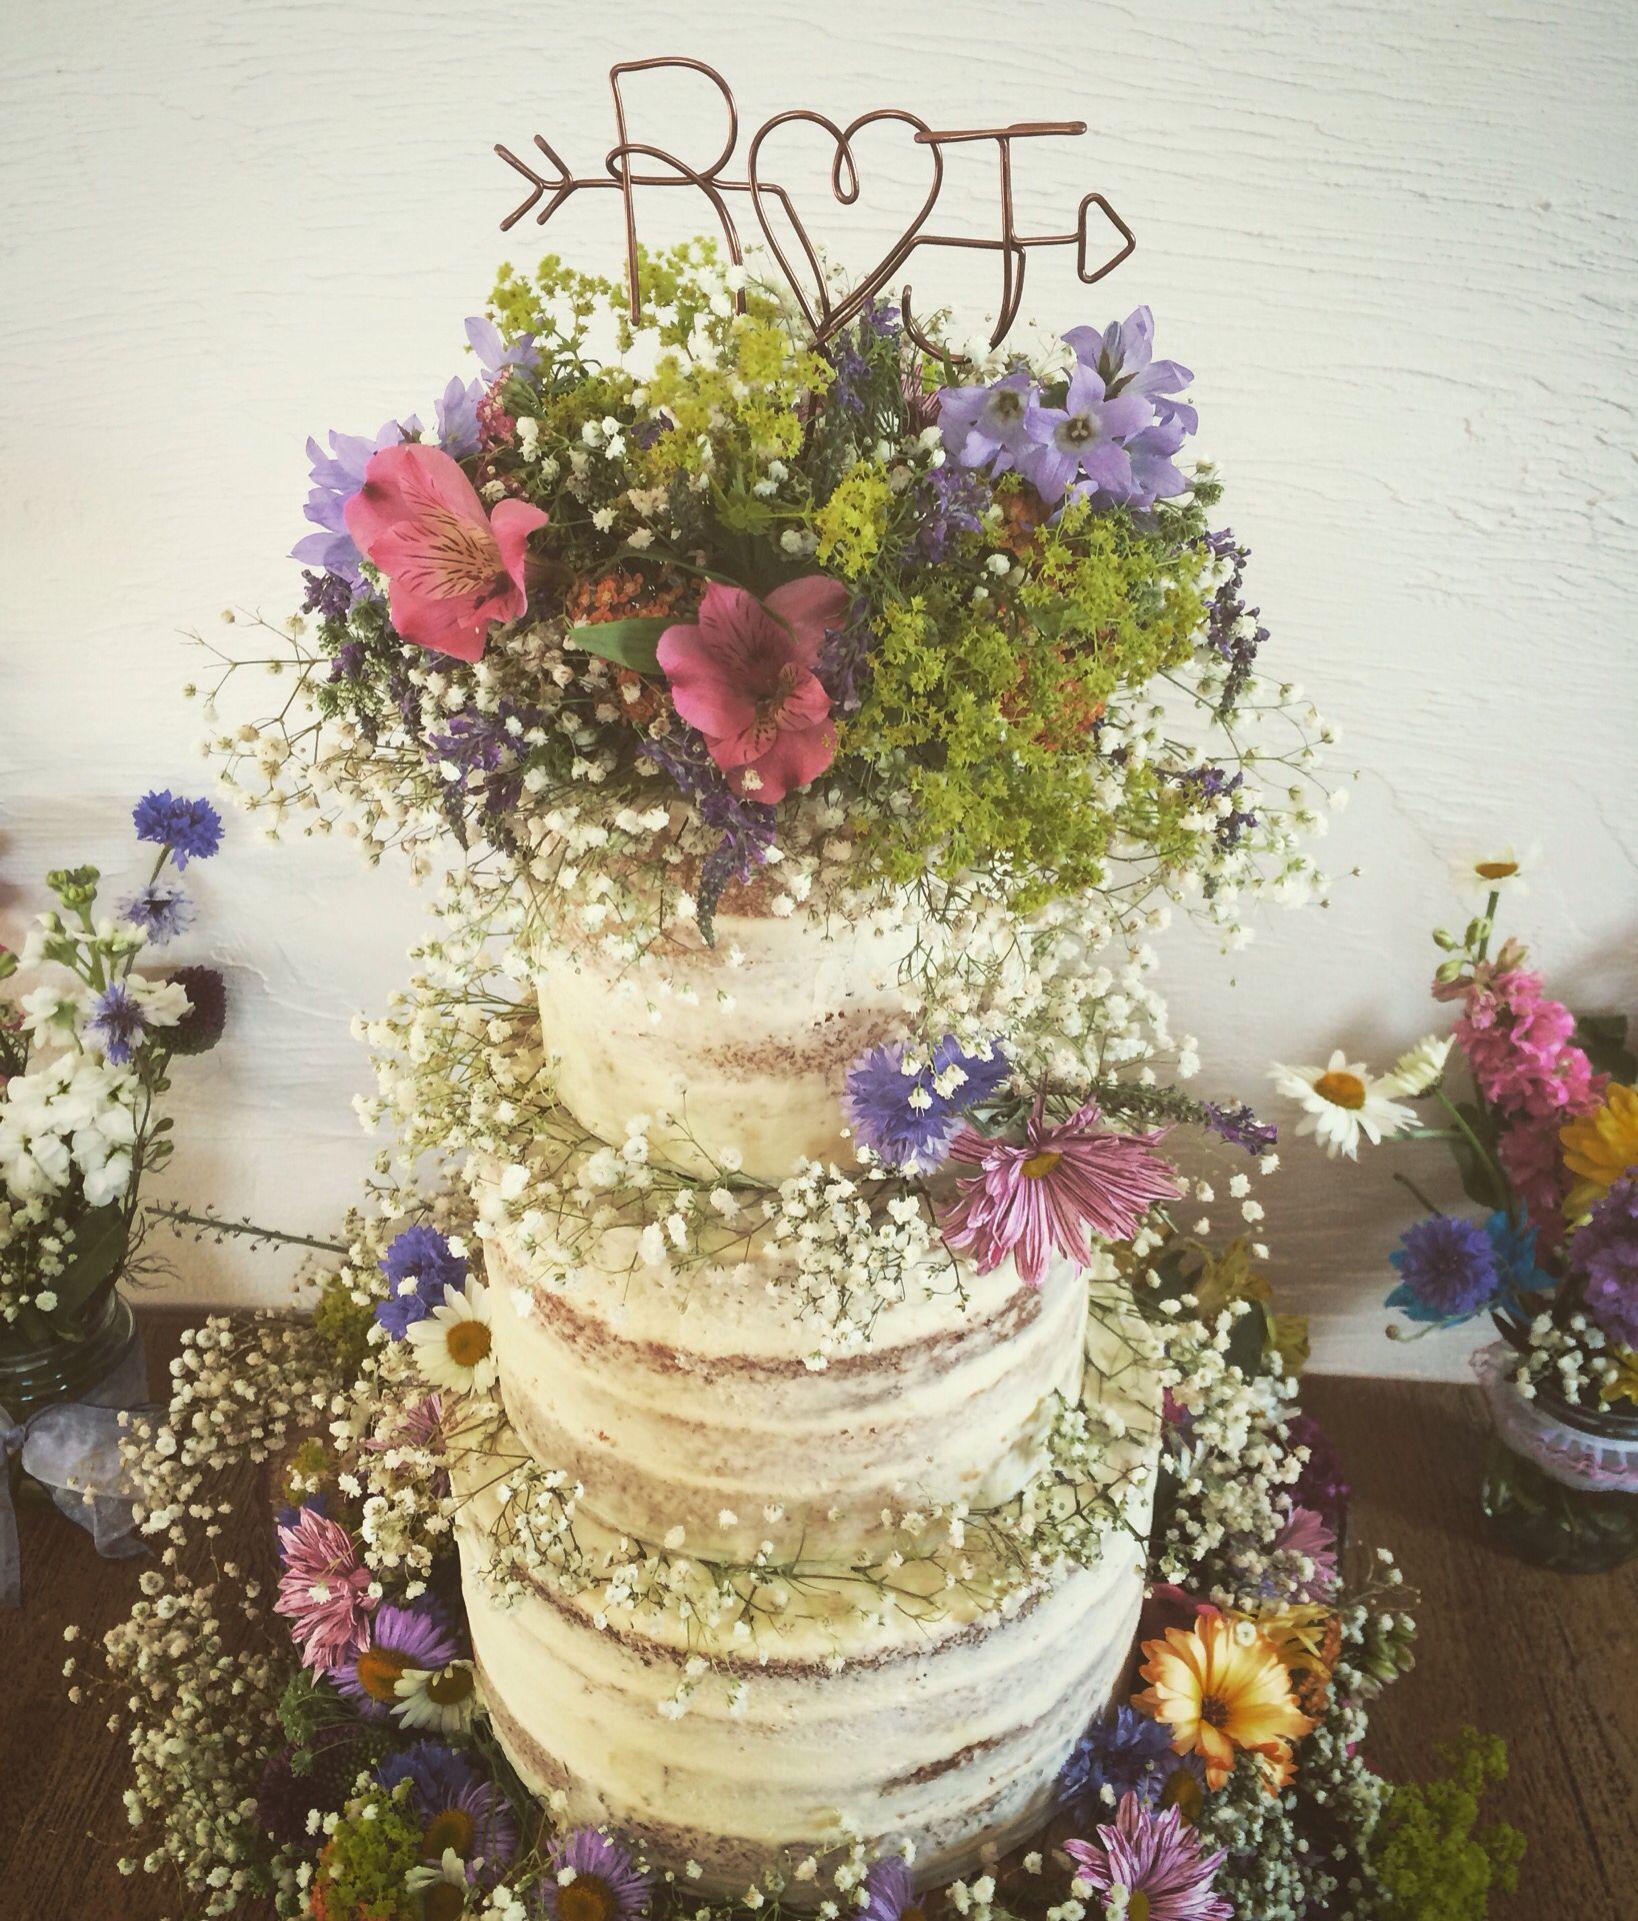 Wild Flowers For Weddings: Rustic Wedding Cake , Semi Naked Wedding Cake With Wild